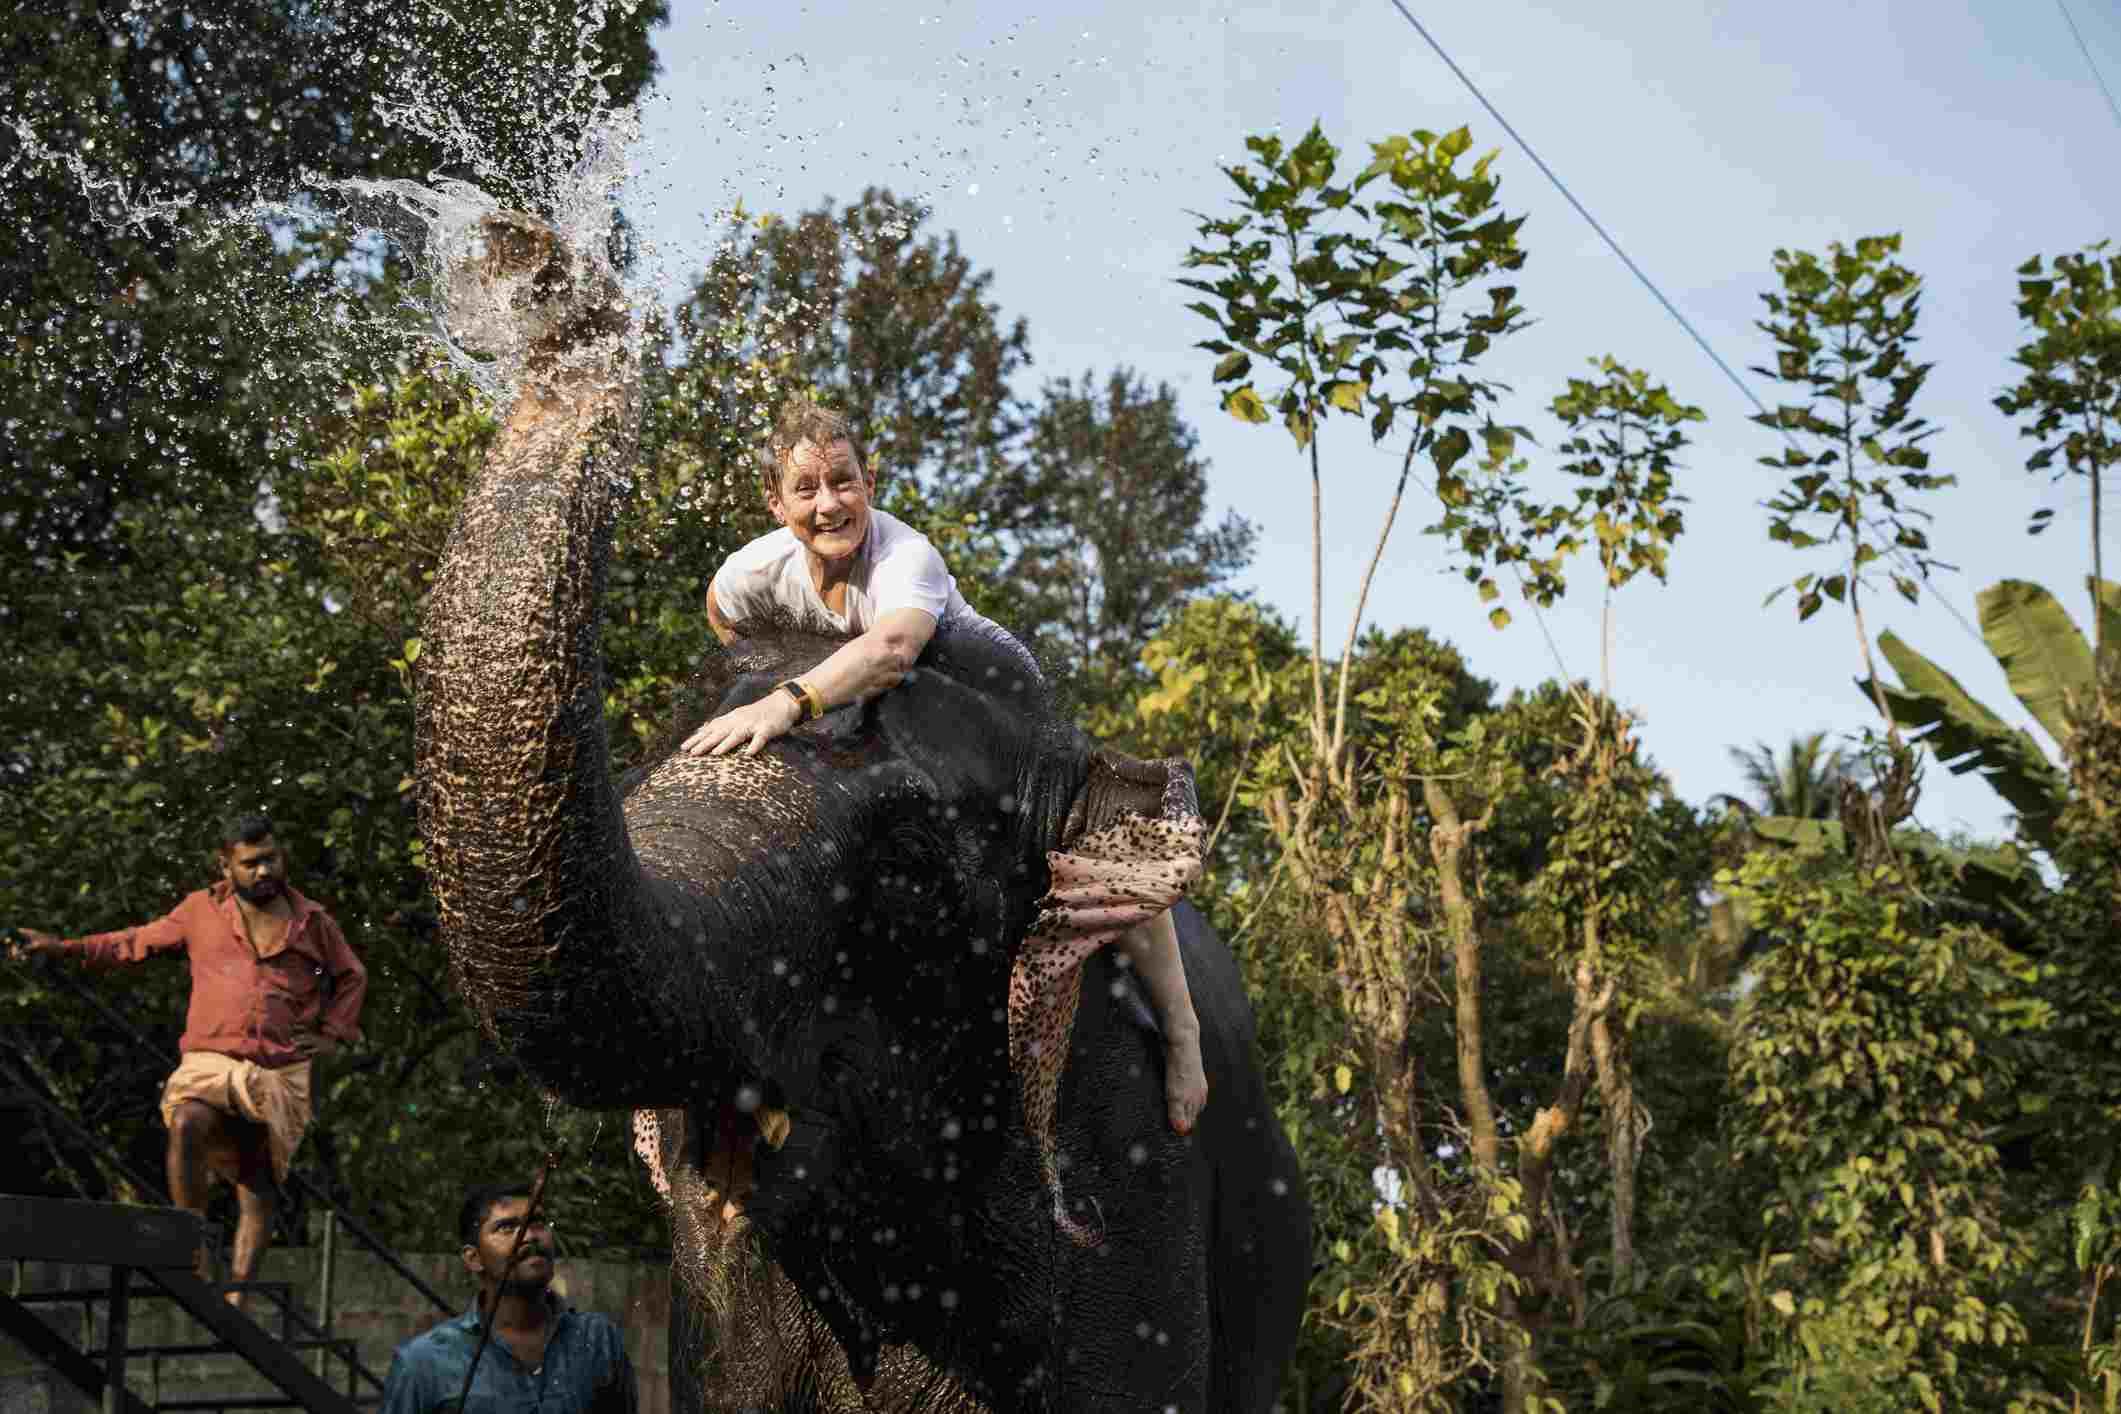 Woman riding an elephant, Thekkady, Kerala, India.